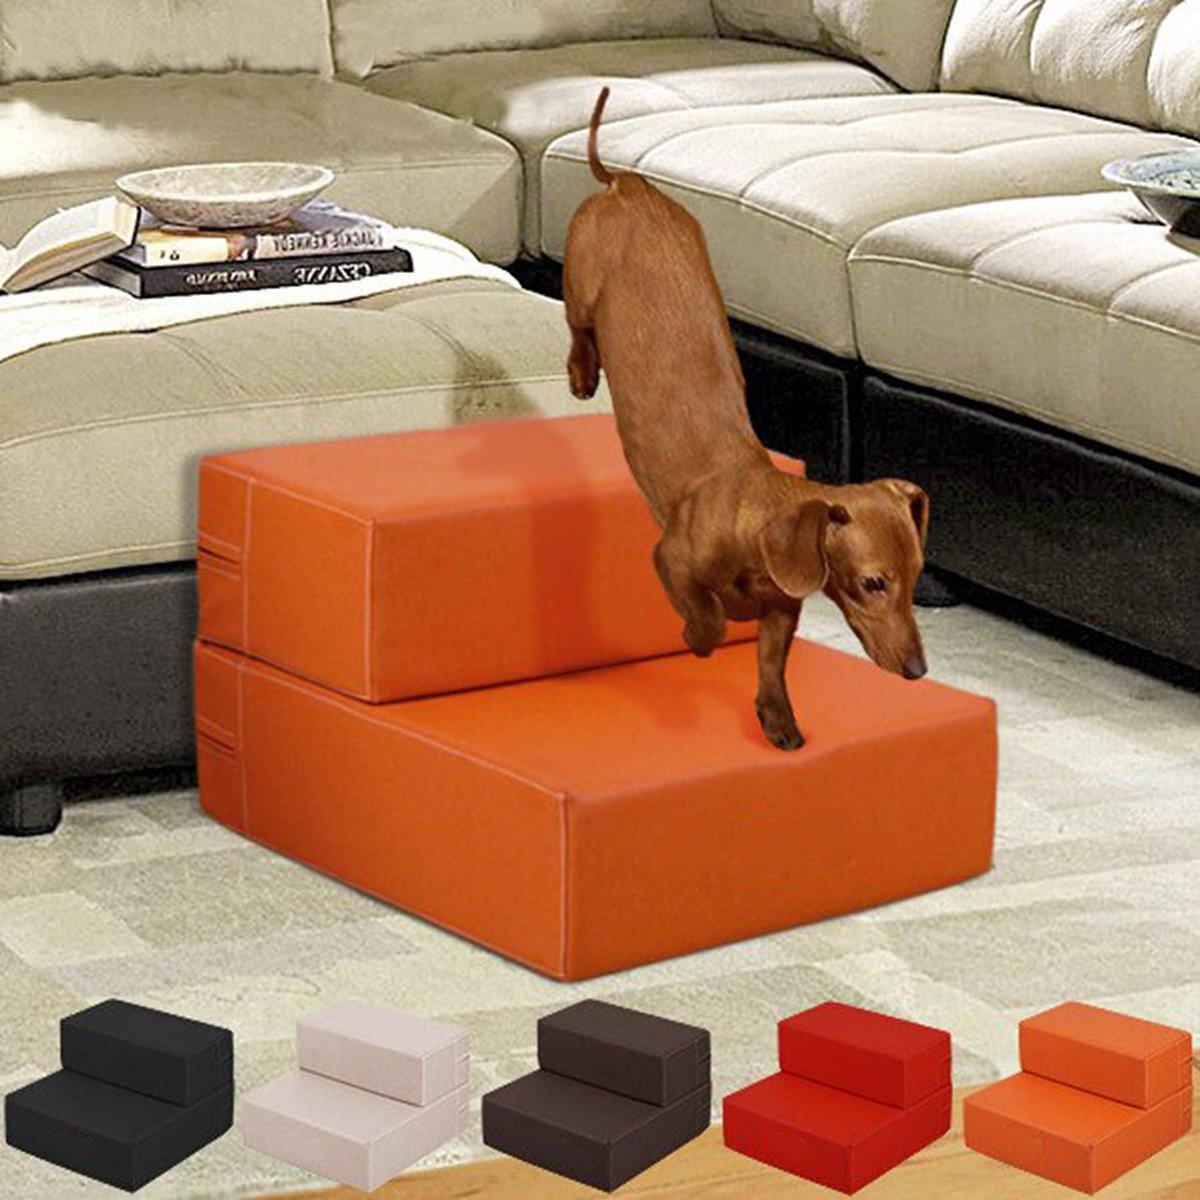 Aliexpress Com Buy Portable Dog Cat Pet Puppy Drinker: Folding Portable 2 Steps Dog Cat Pet Stairs Ramp Ladder